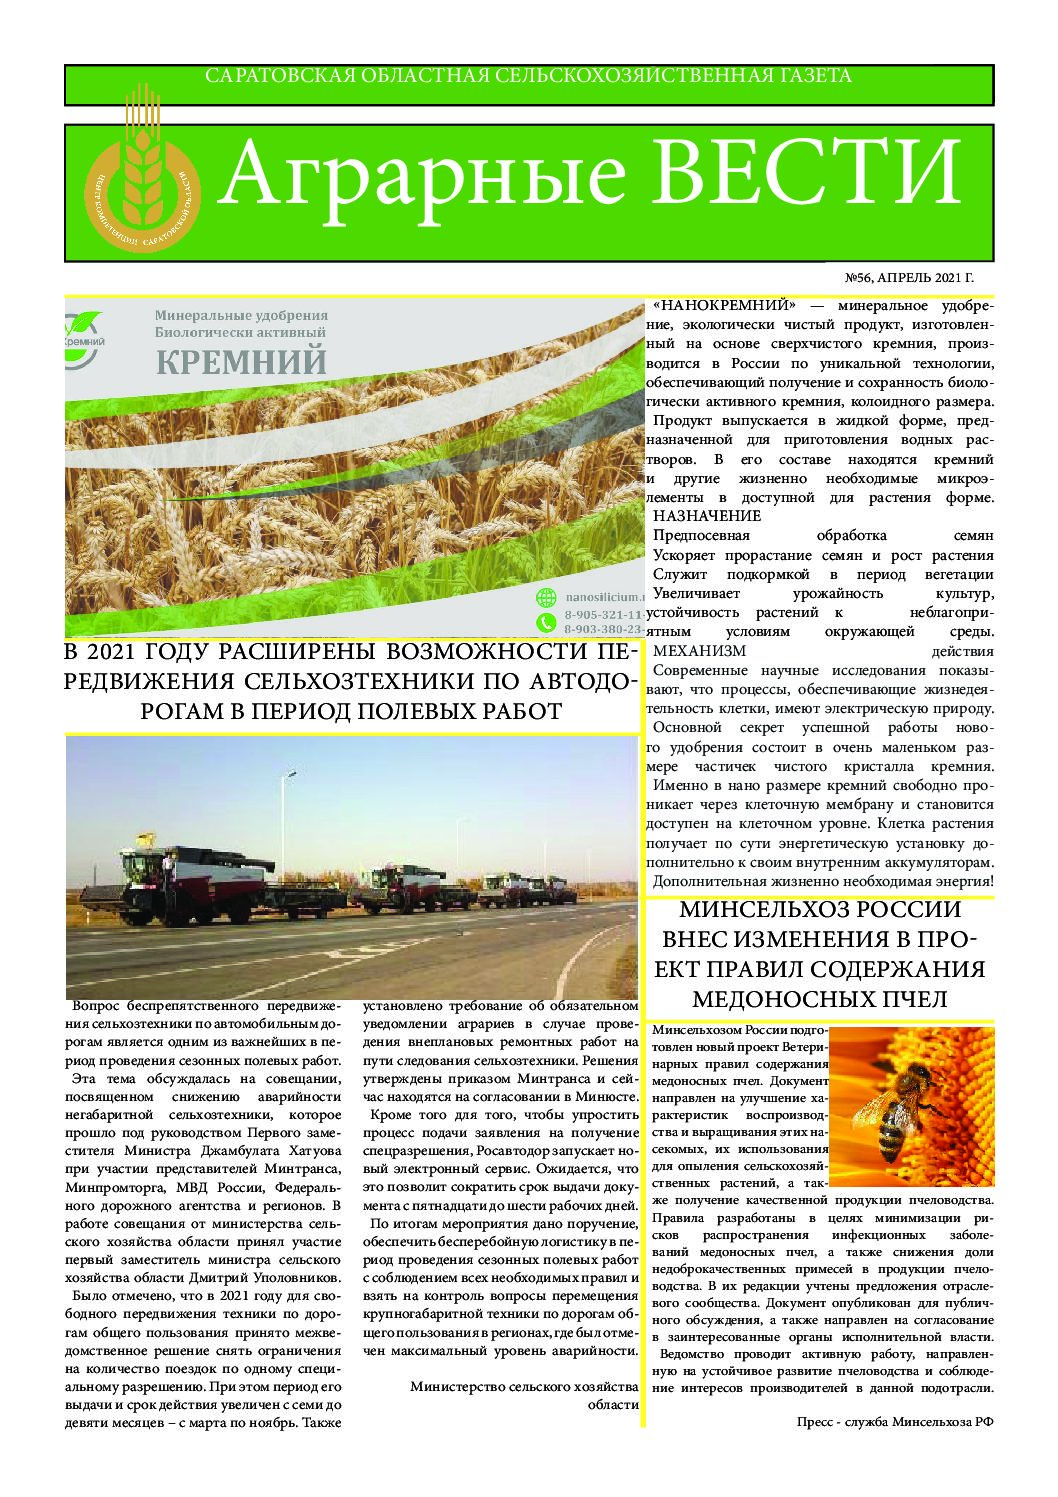 https://saratovagro.ru/wp-content/uploads/2021/08/Газета-апрель-2021-pdf.jpg